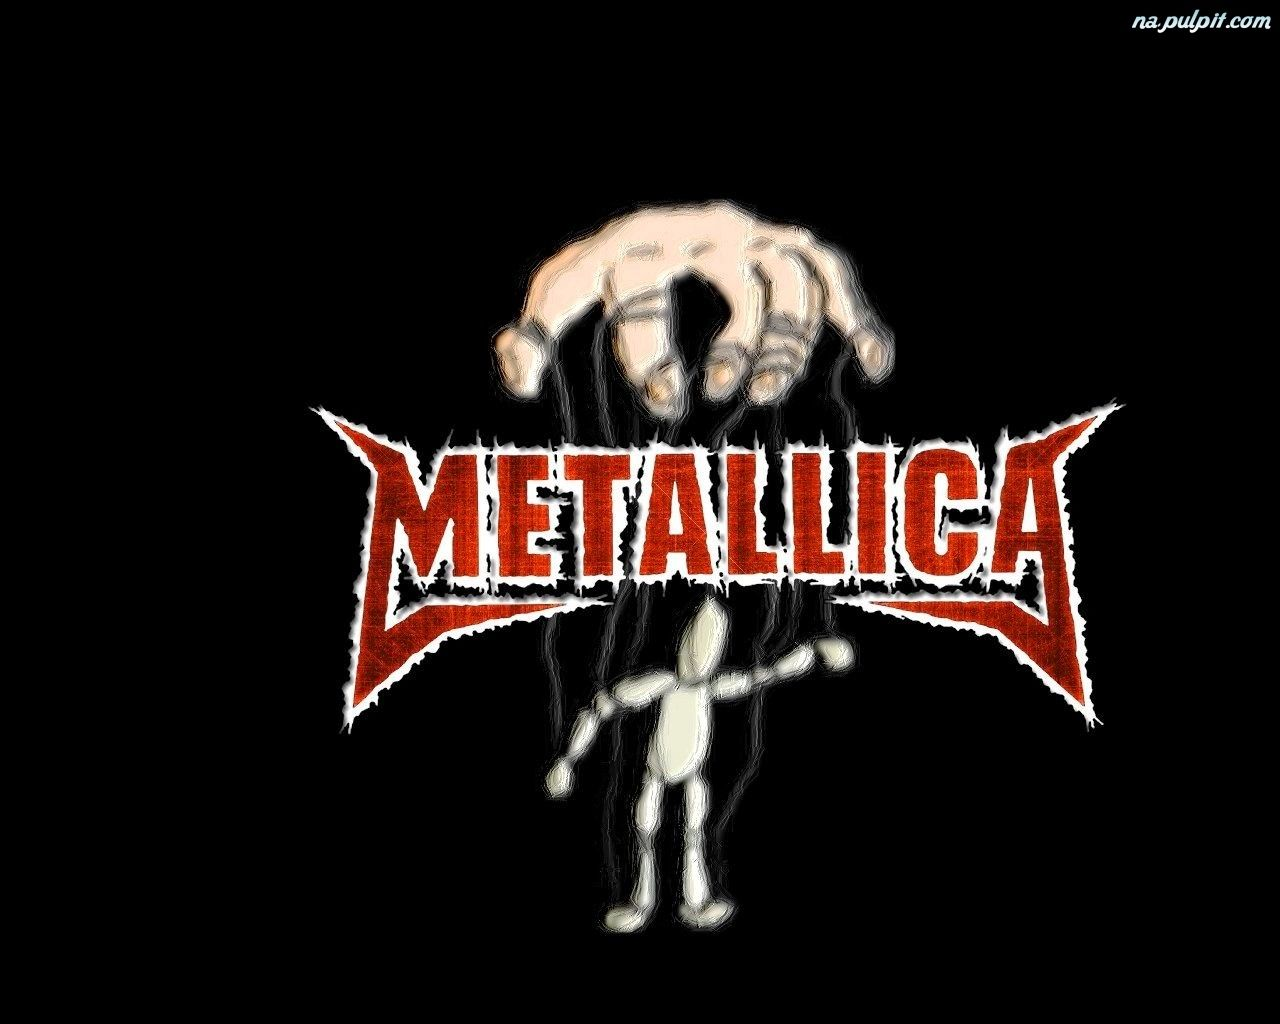 Metallica Logo Desktop Wallpaper  31   Metallicawallpapercom 1280x1024